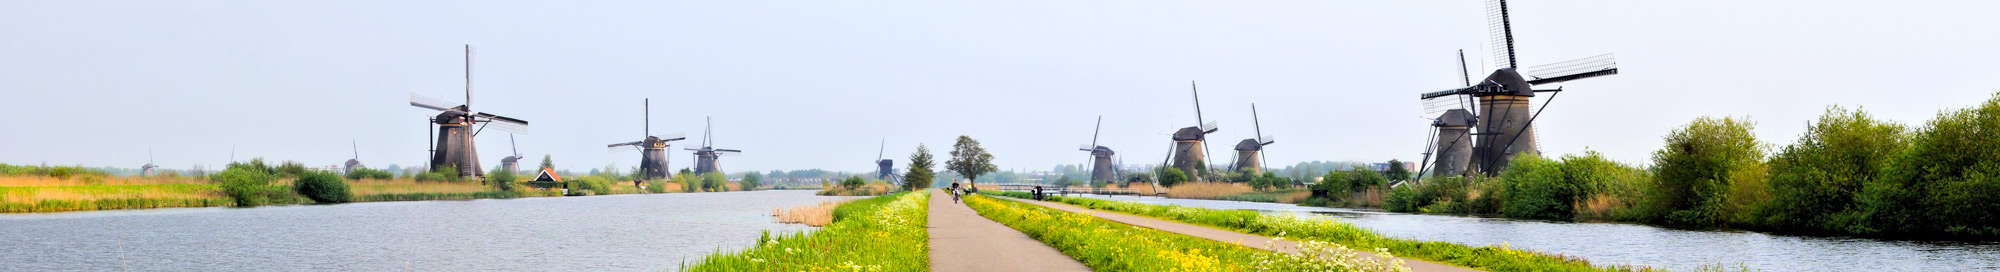 Week-end et séjour La Haye Scheveningen